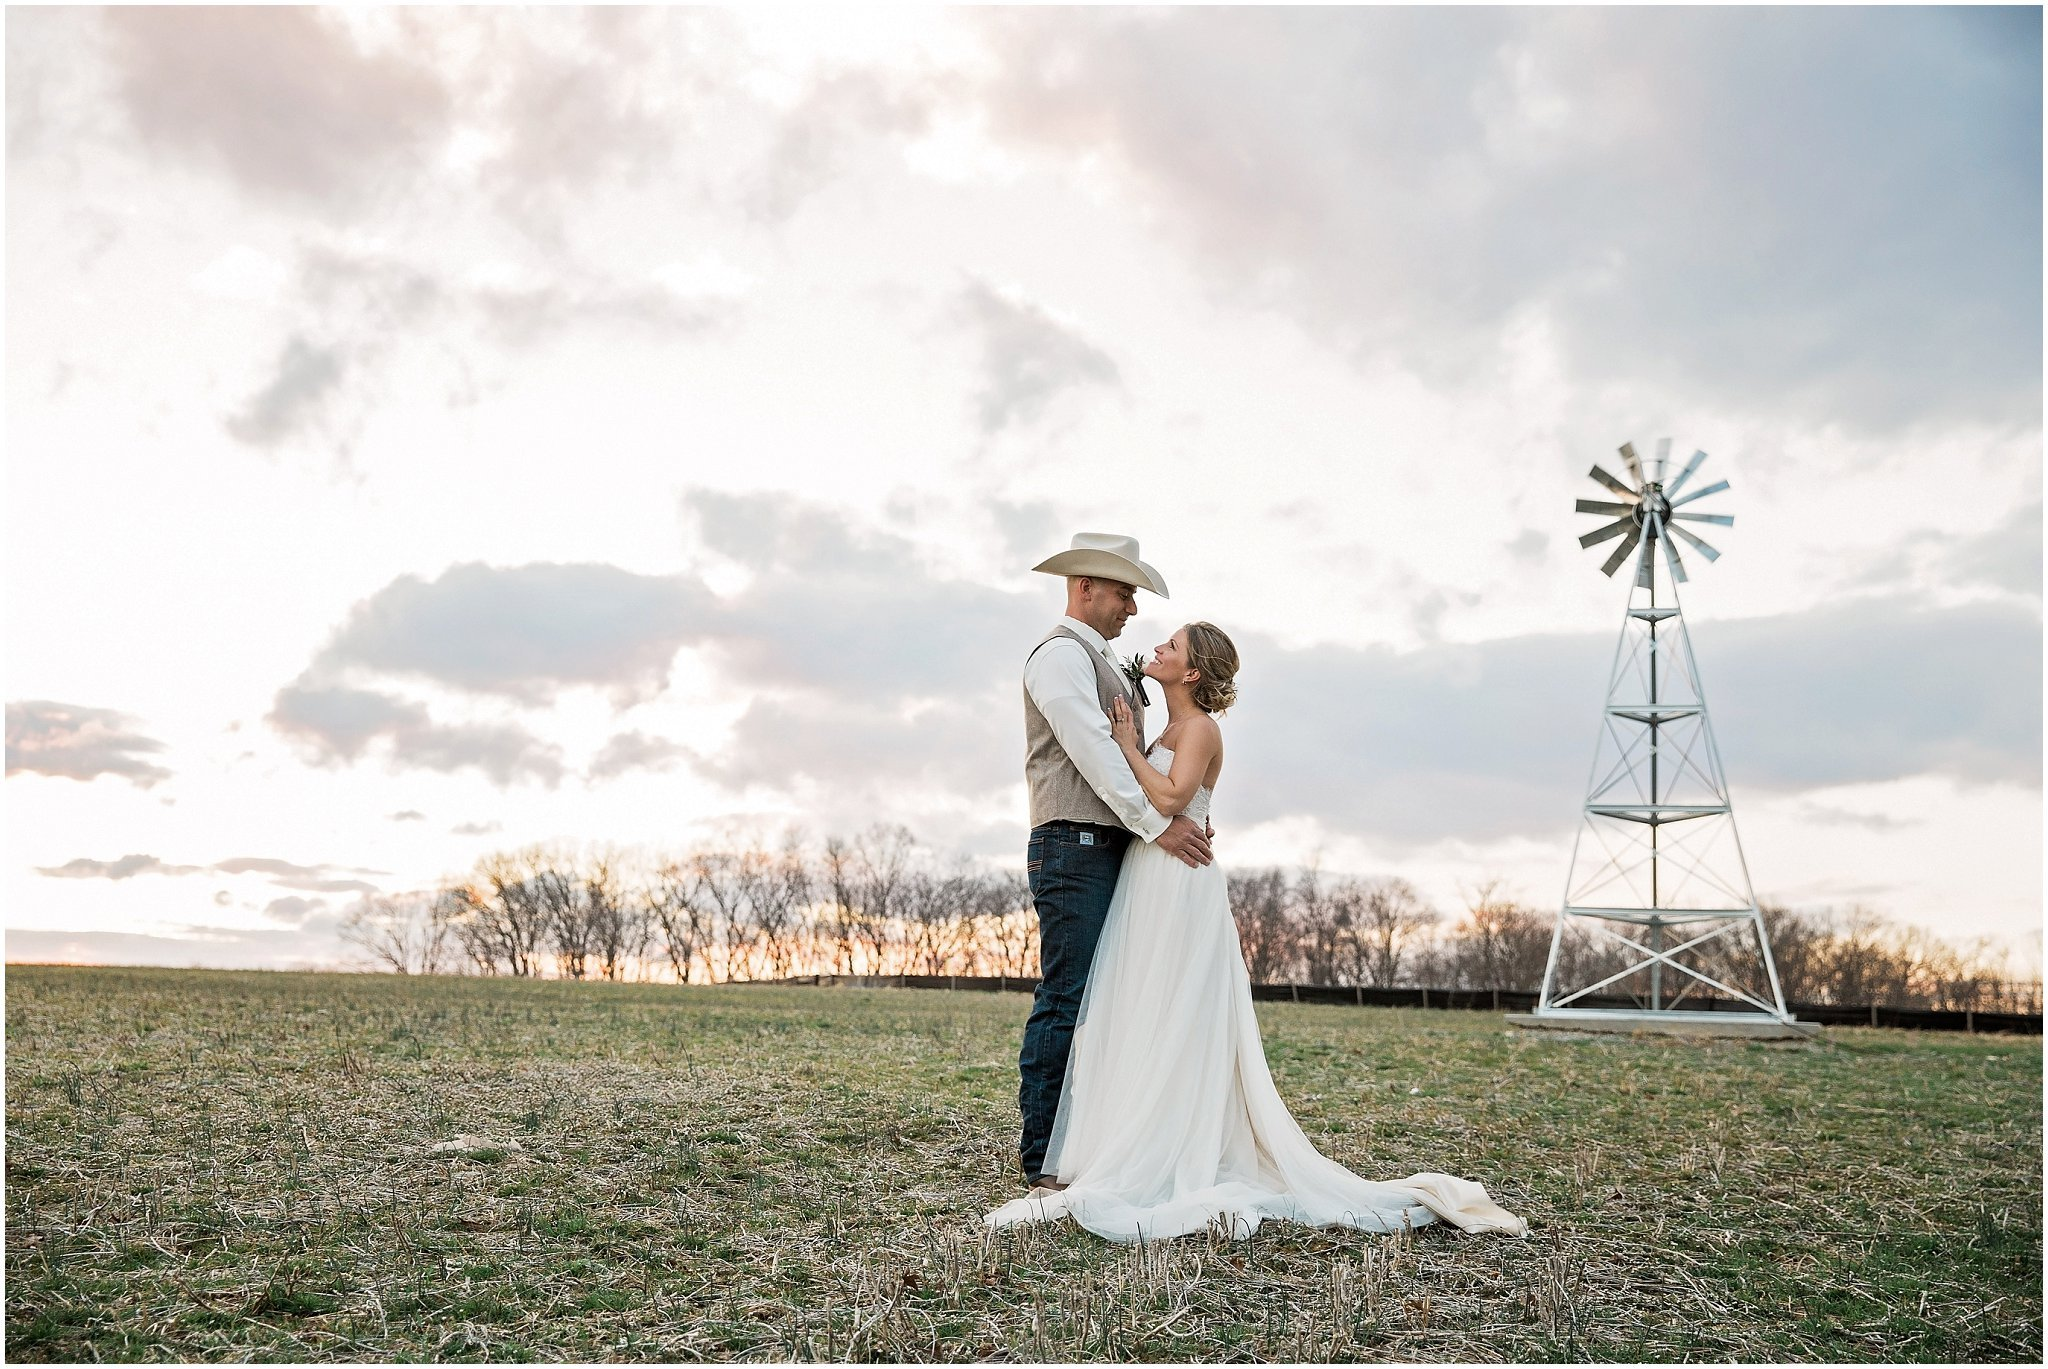 Rosewood Farms Elkon MD